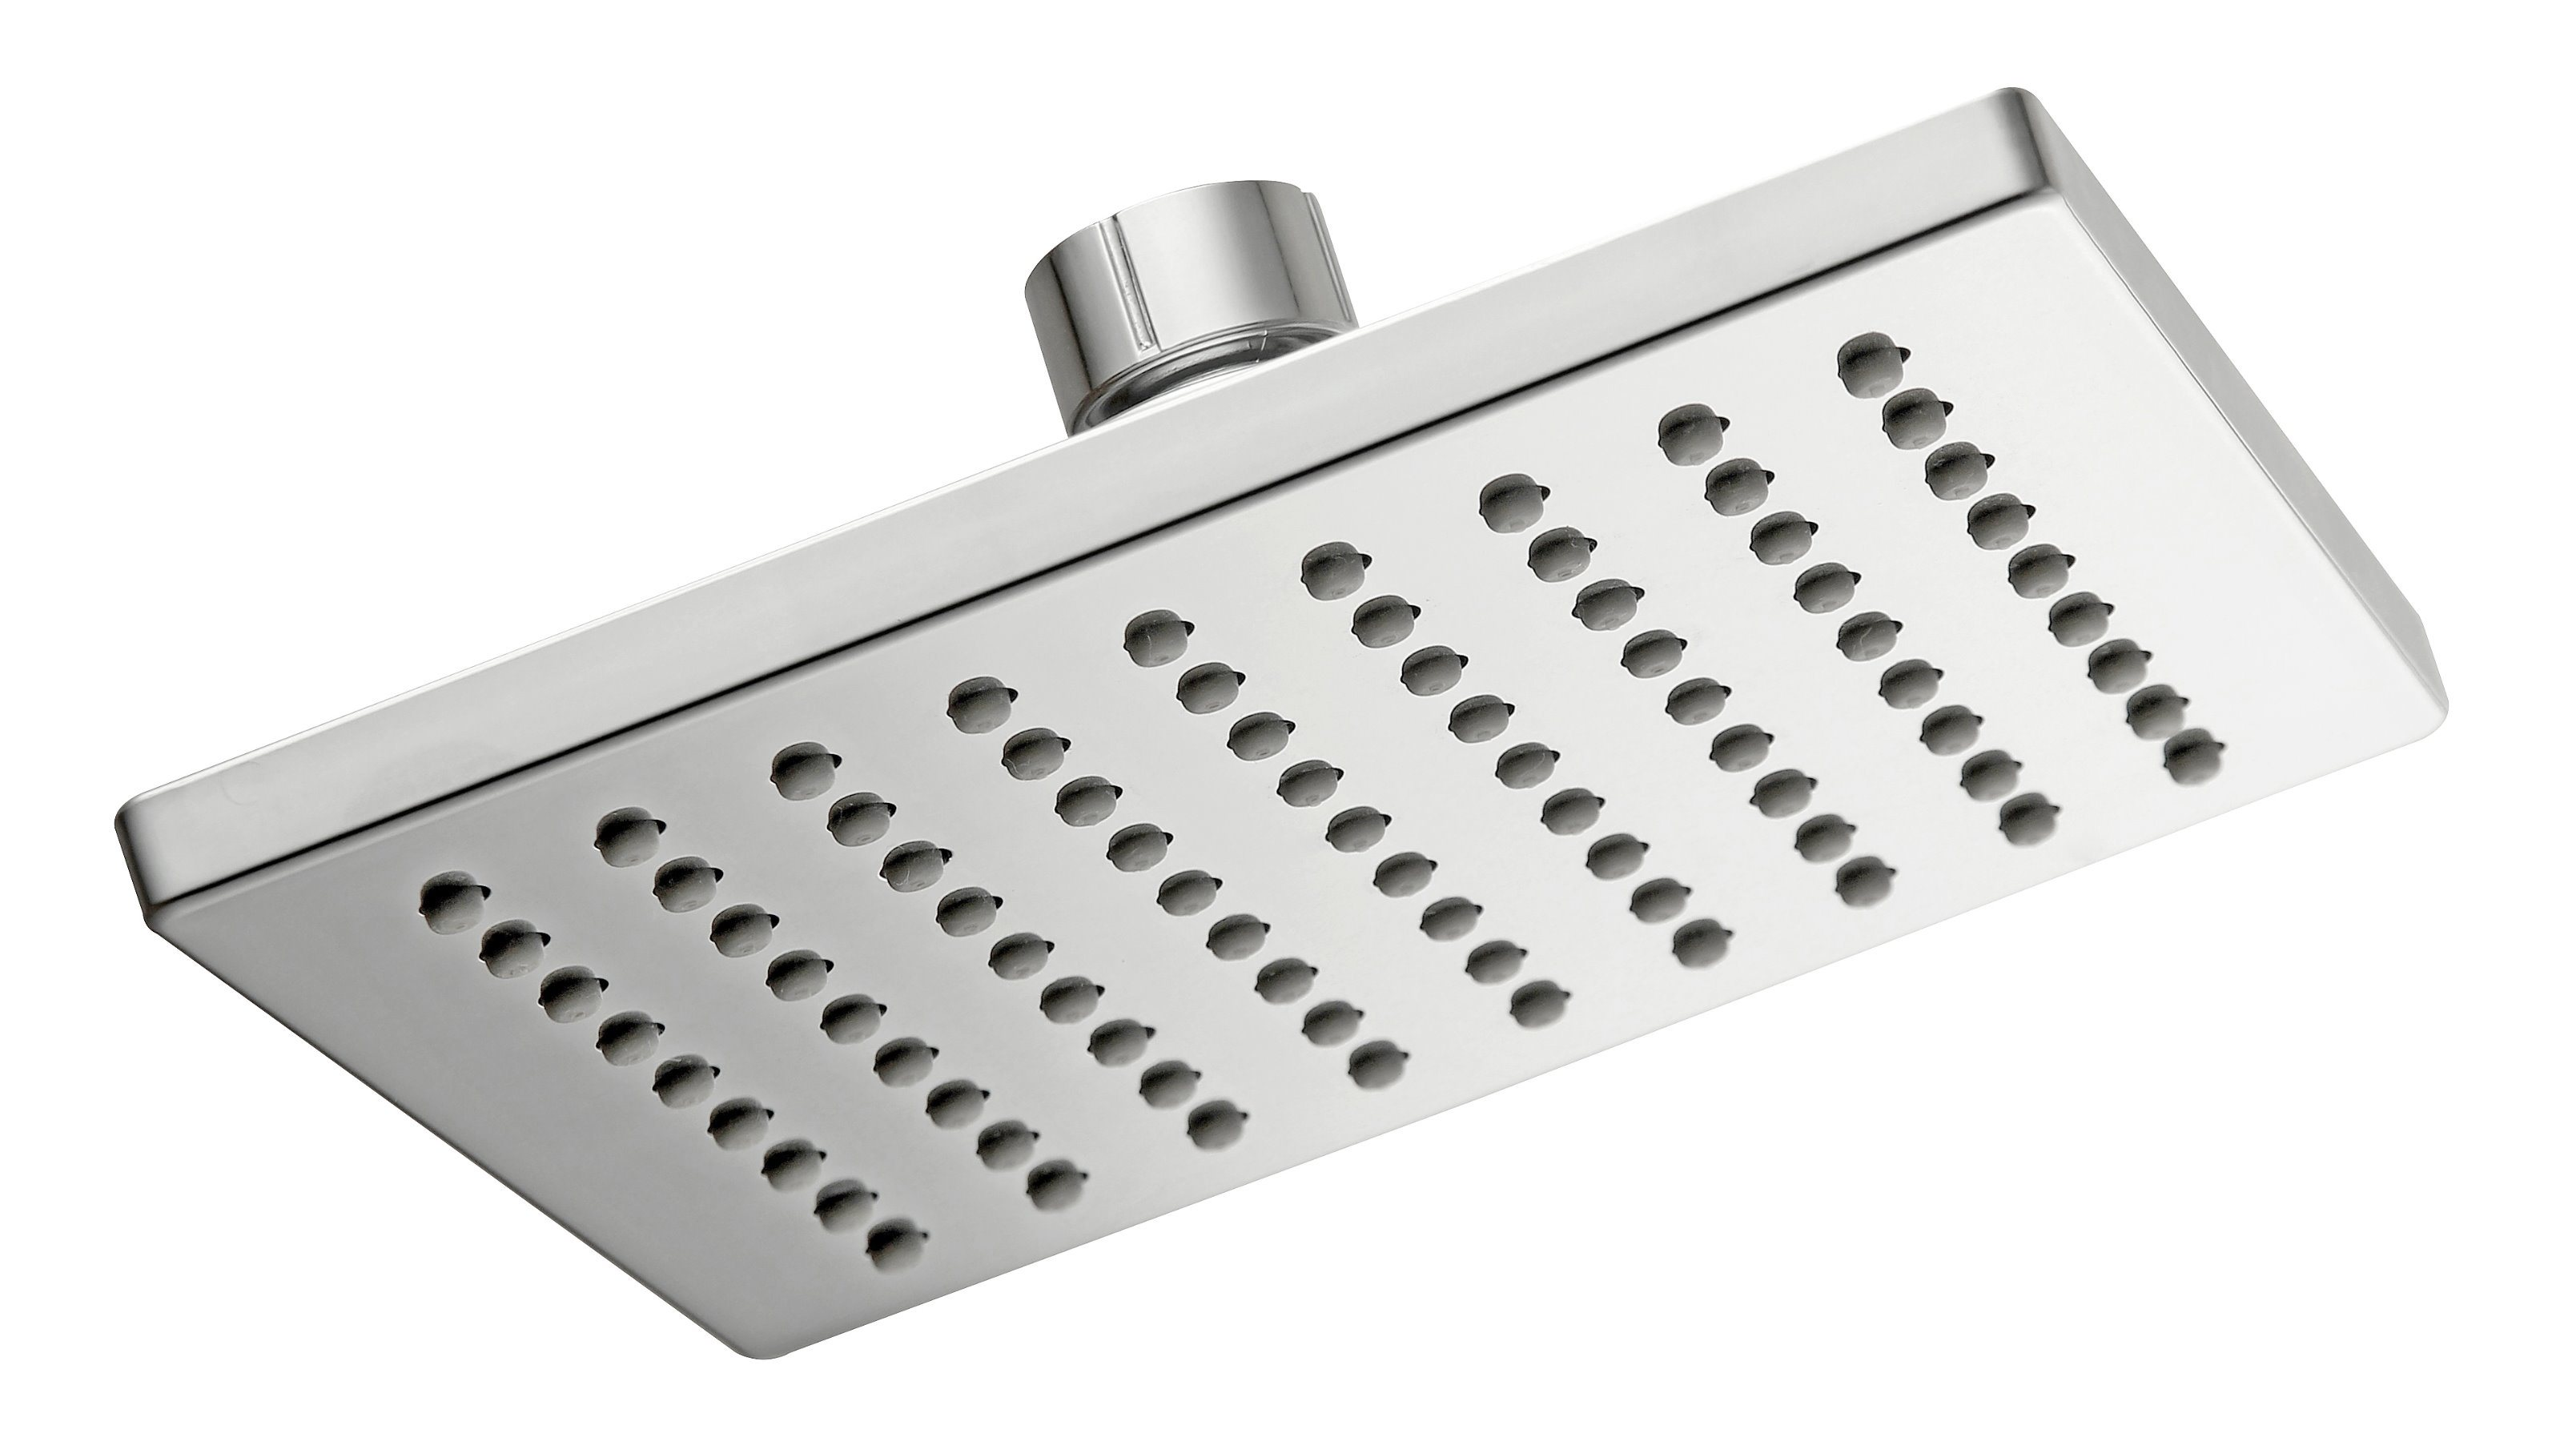 Hot Item Rain Shower Bathroom Shower Head Shower Stainless Steel Plate 1 Function 6 Square Overhead Shower Rain Shower B28511 Chrome Face Water